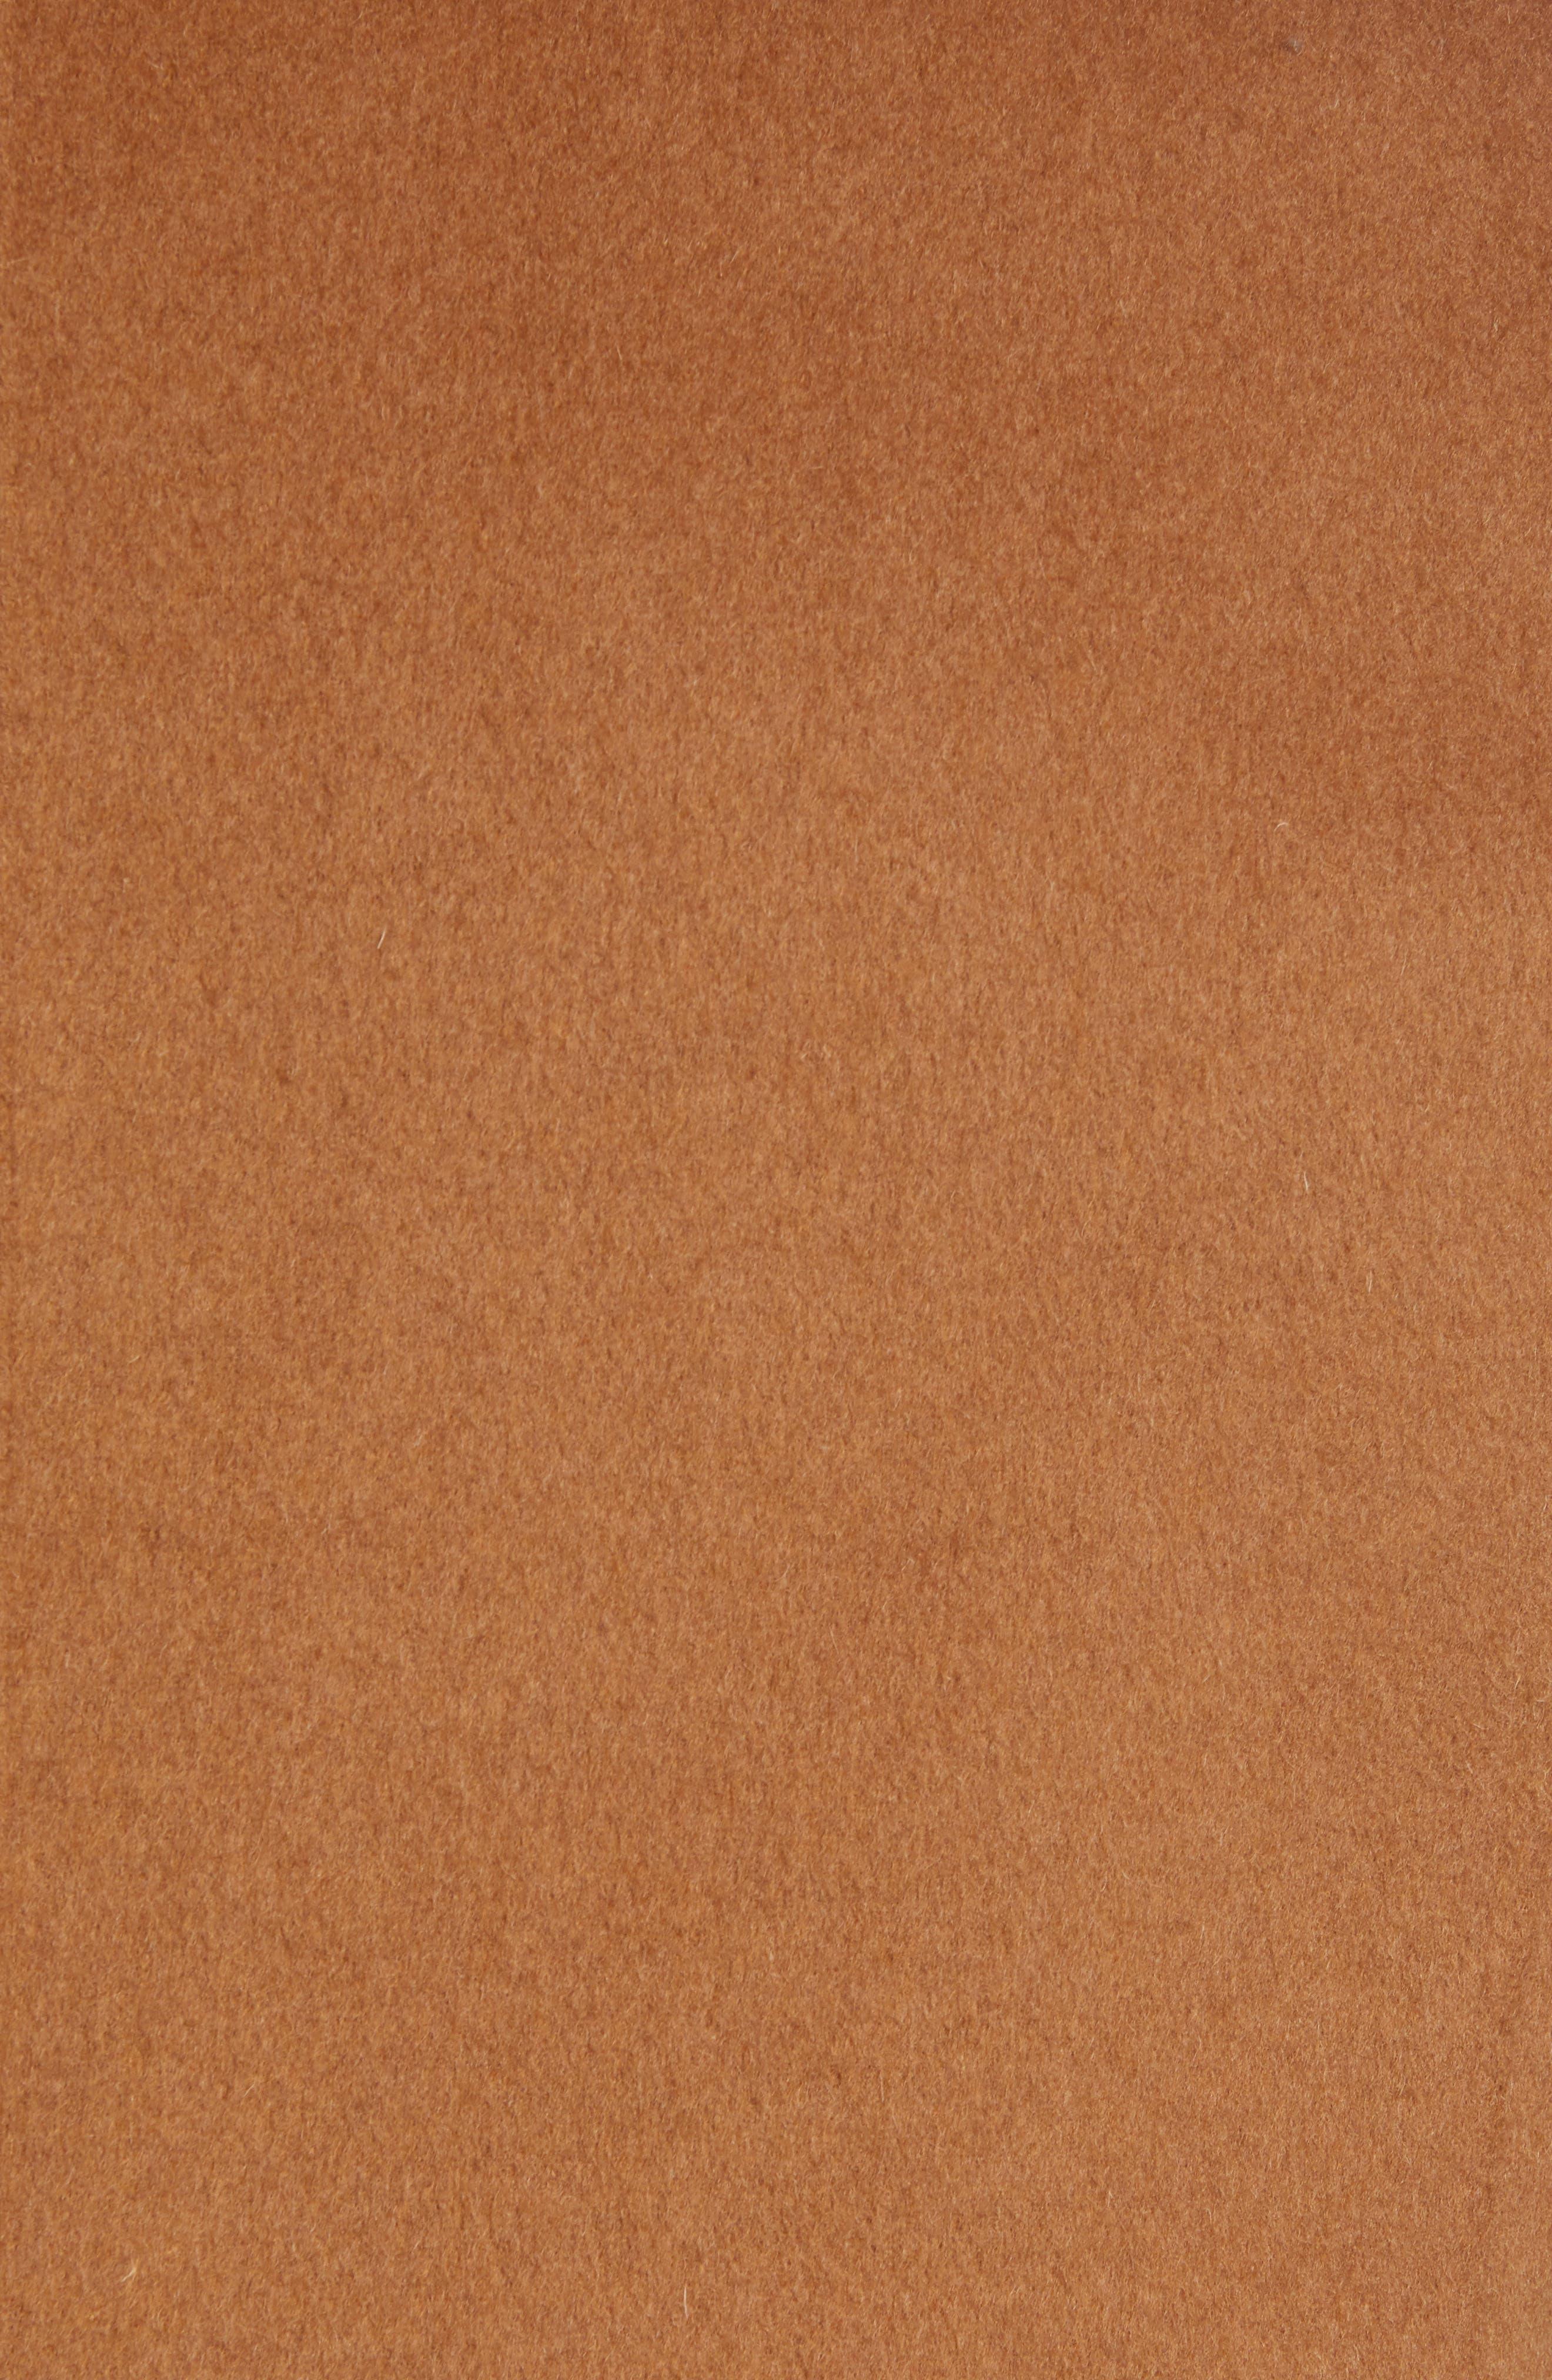 Wool Blend Topcoat,                             Alternate thumbnail 17, color,